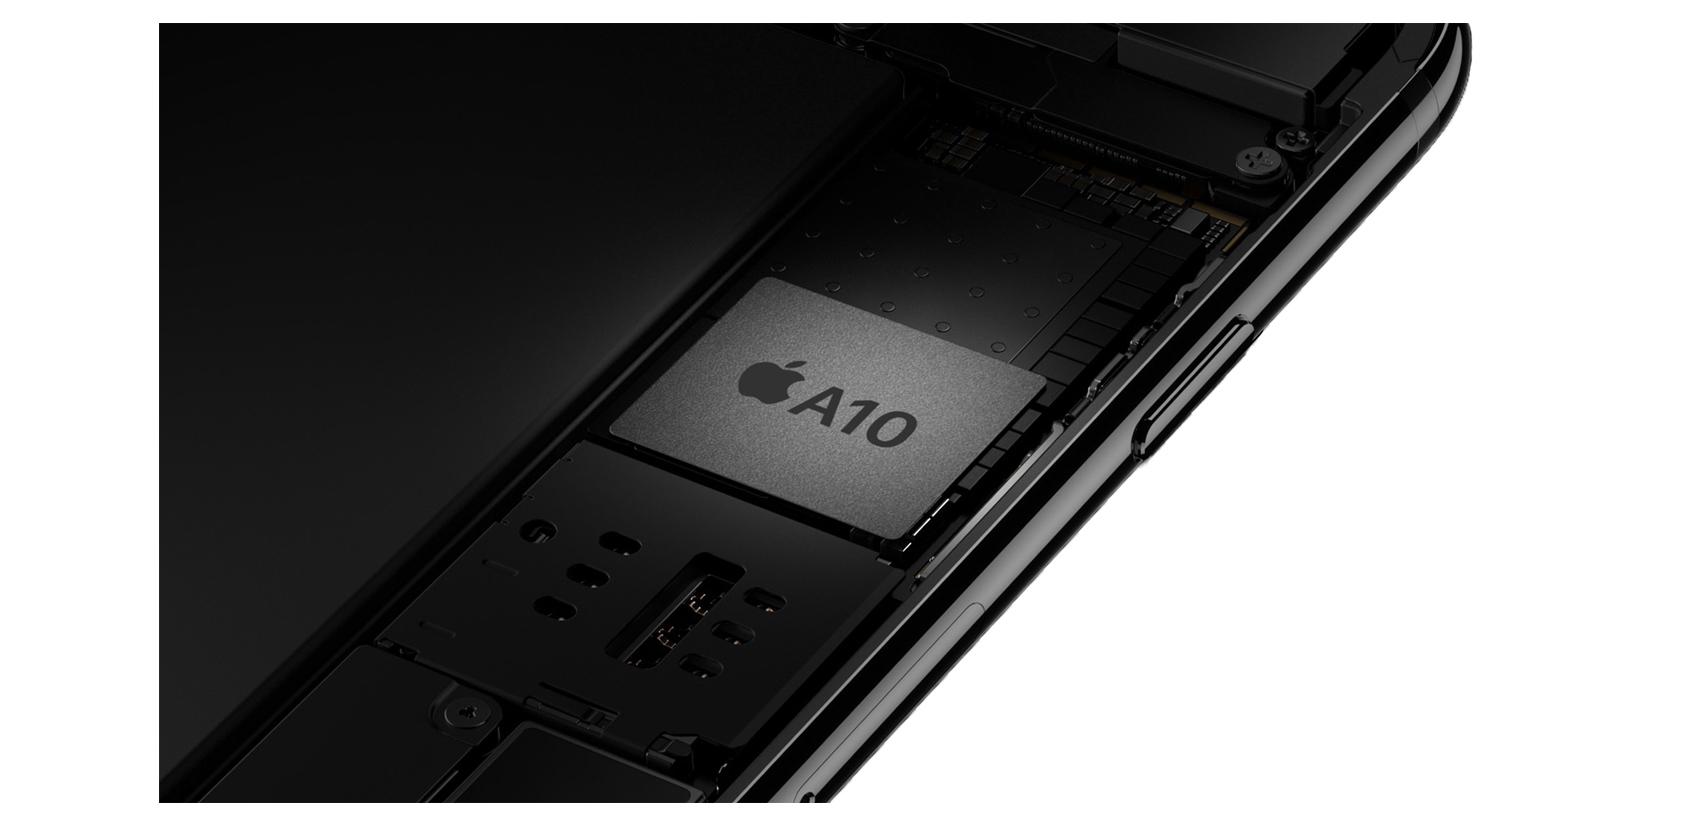 Apple iPhone 7 Plus Jet Black_11_1